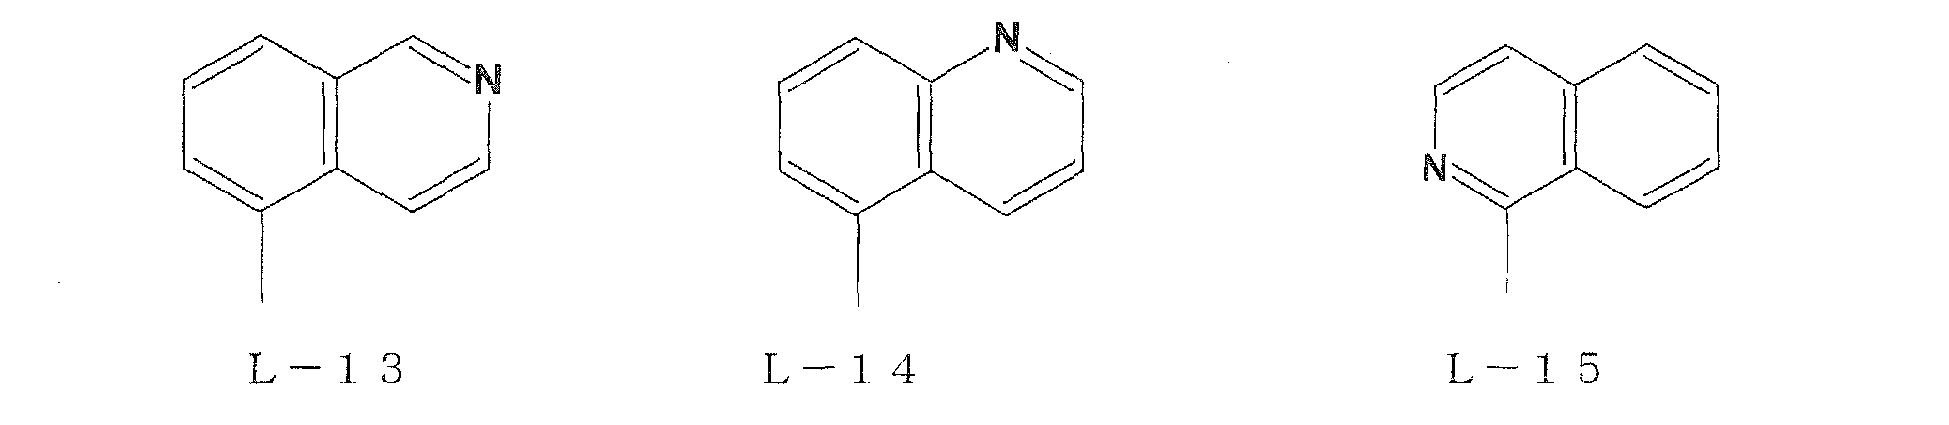 Figure imgb0021